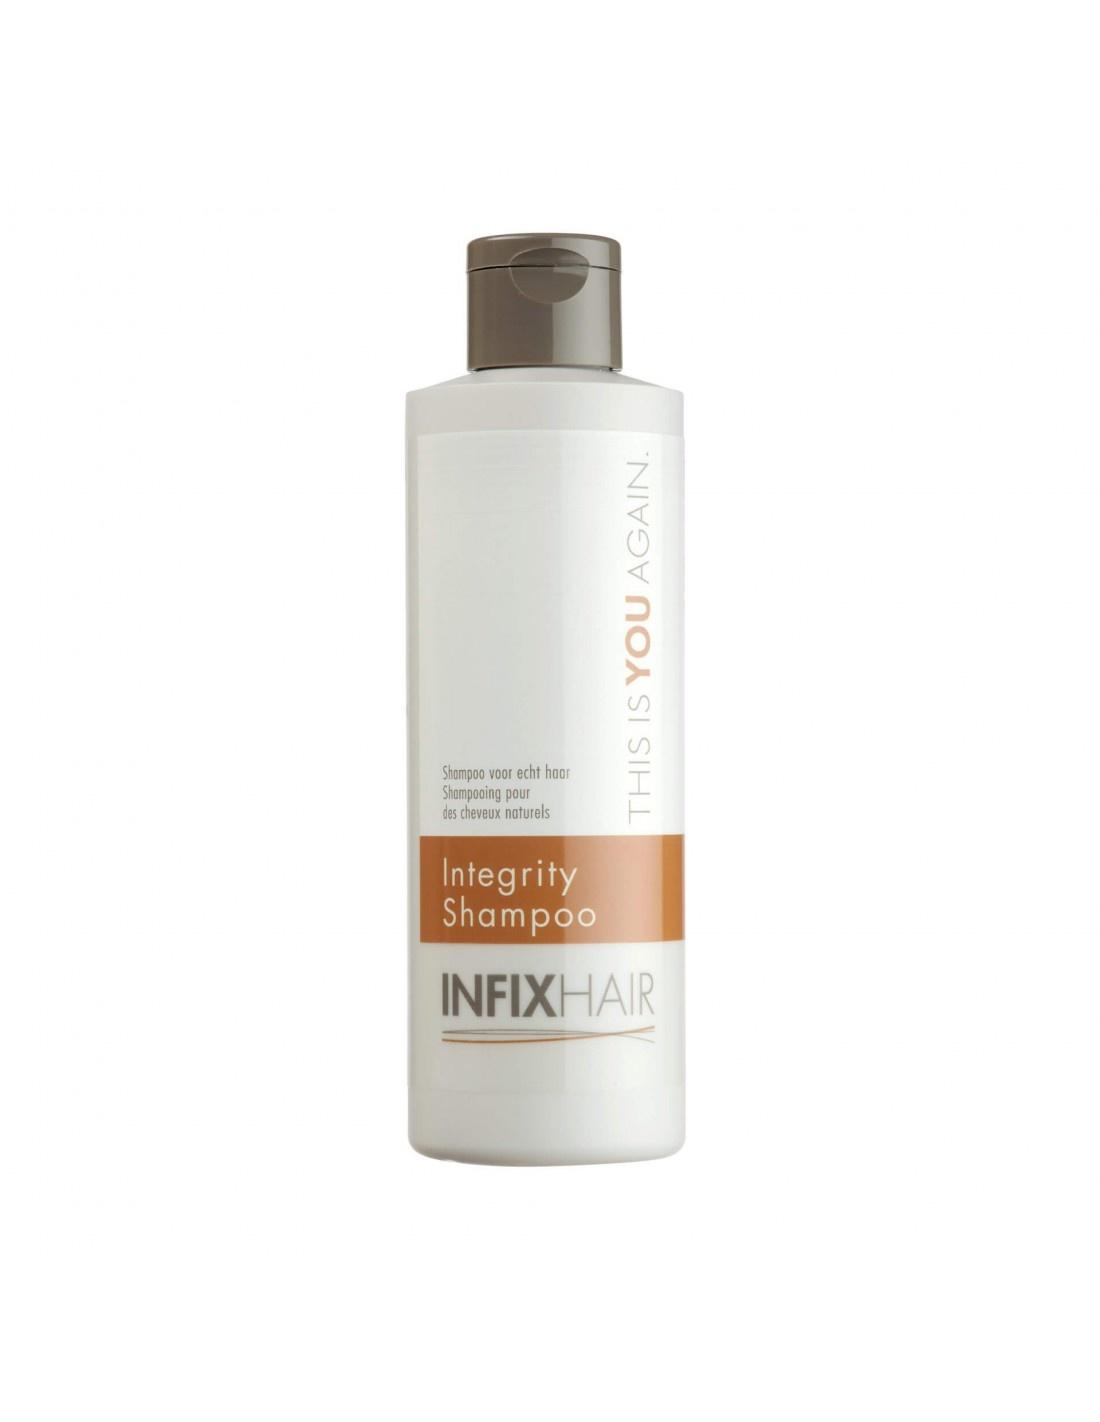 In Fix Hair Integrity Shampoo